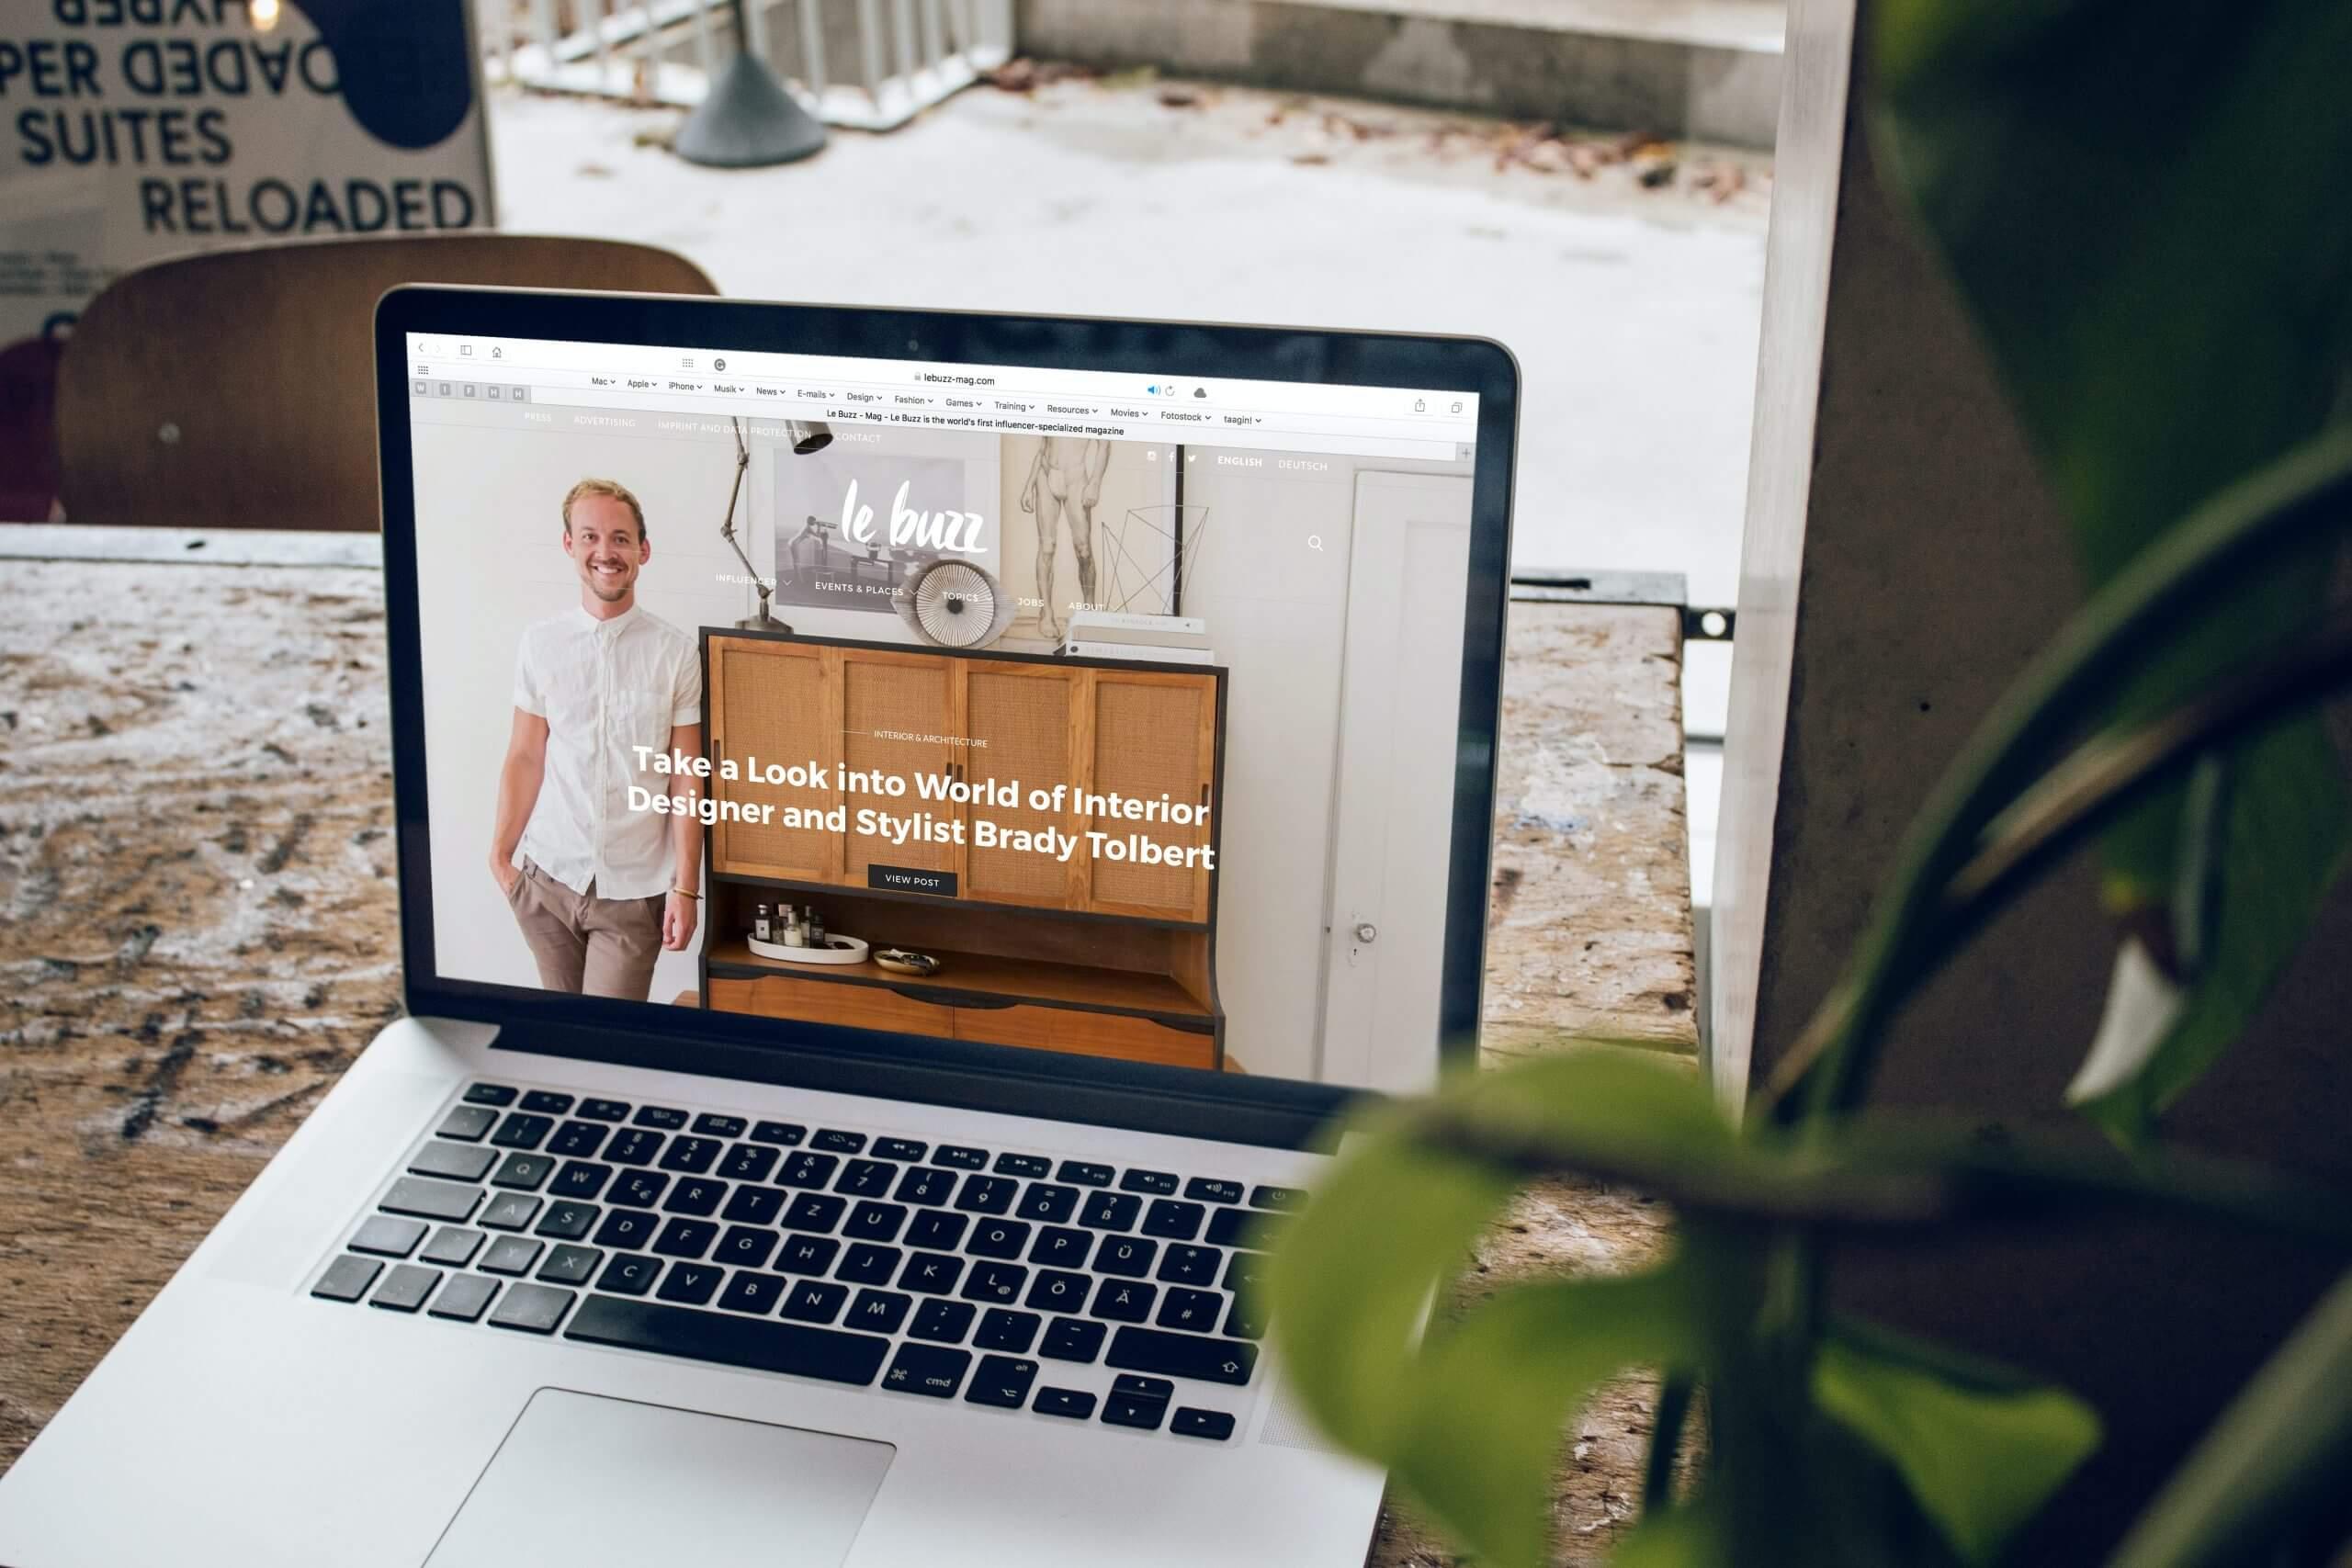 a website with a CTA